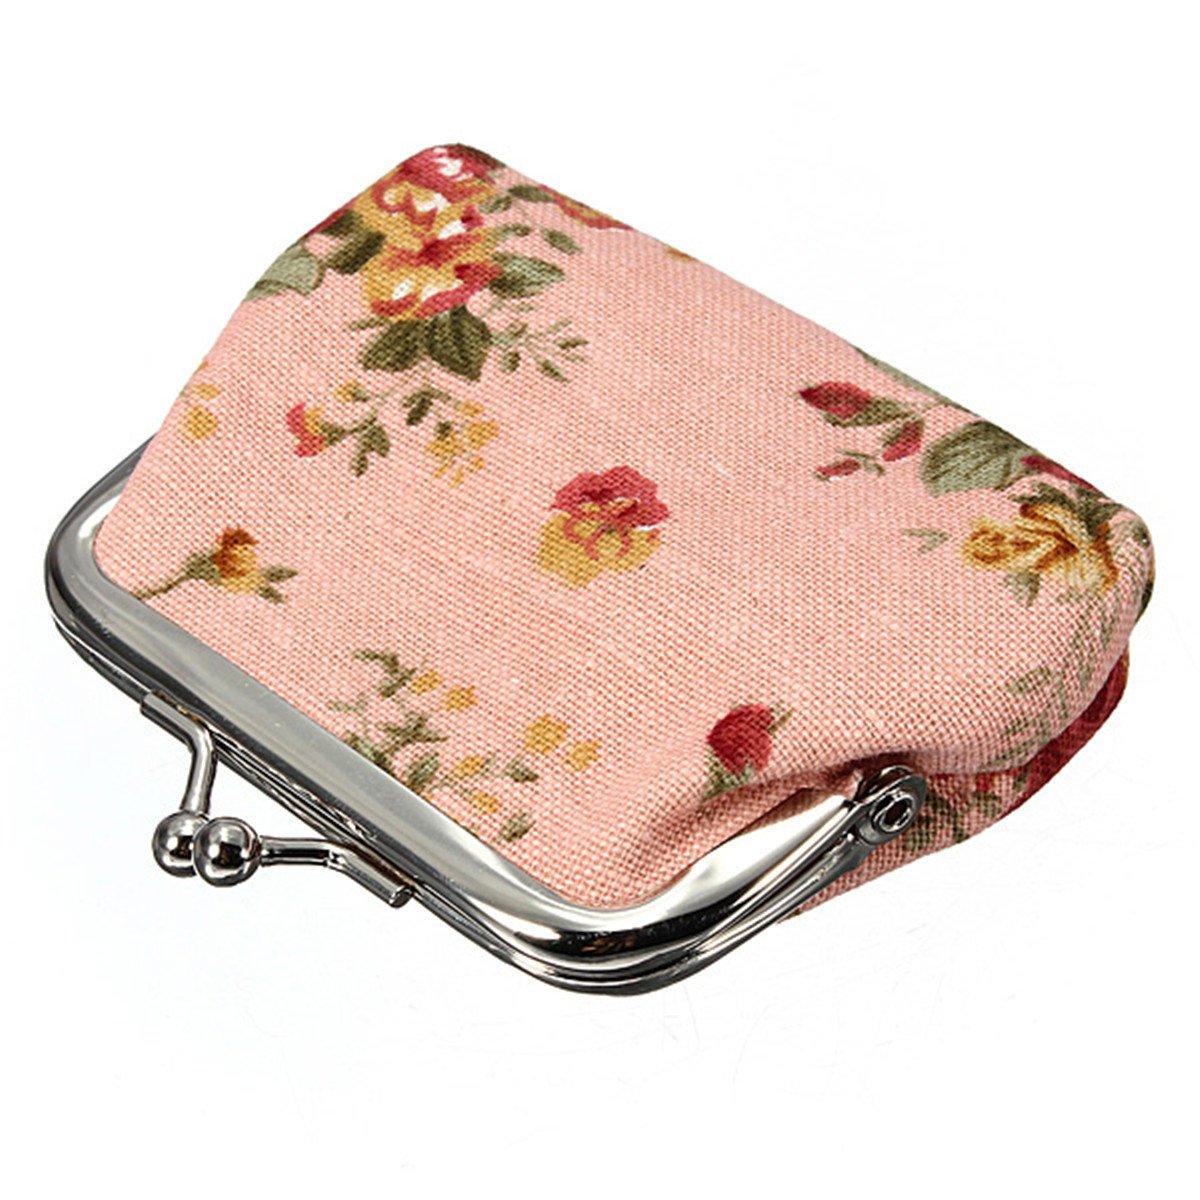 Wholesale 10*AUAU Women Roses Floral Fabric Clip Mini Small Coin Pocket Purse Bag Clutch